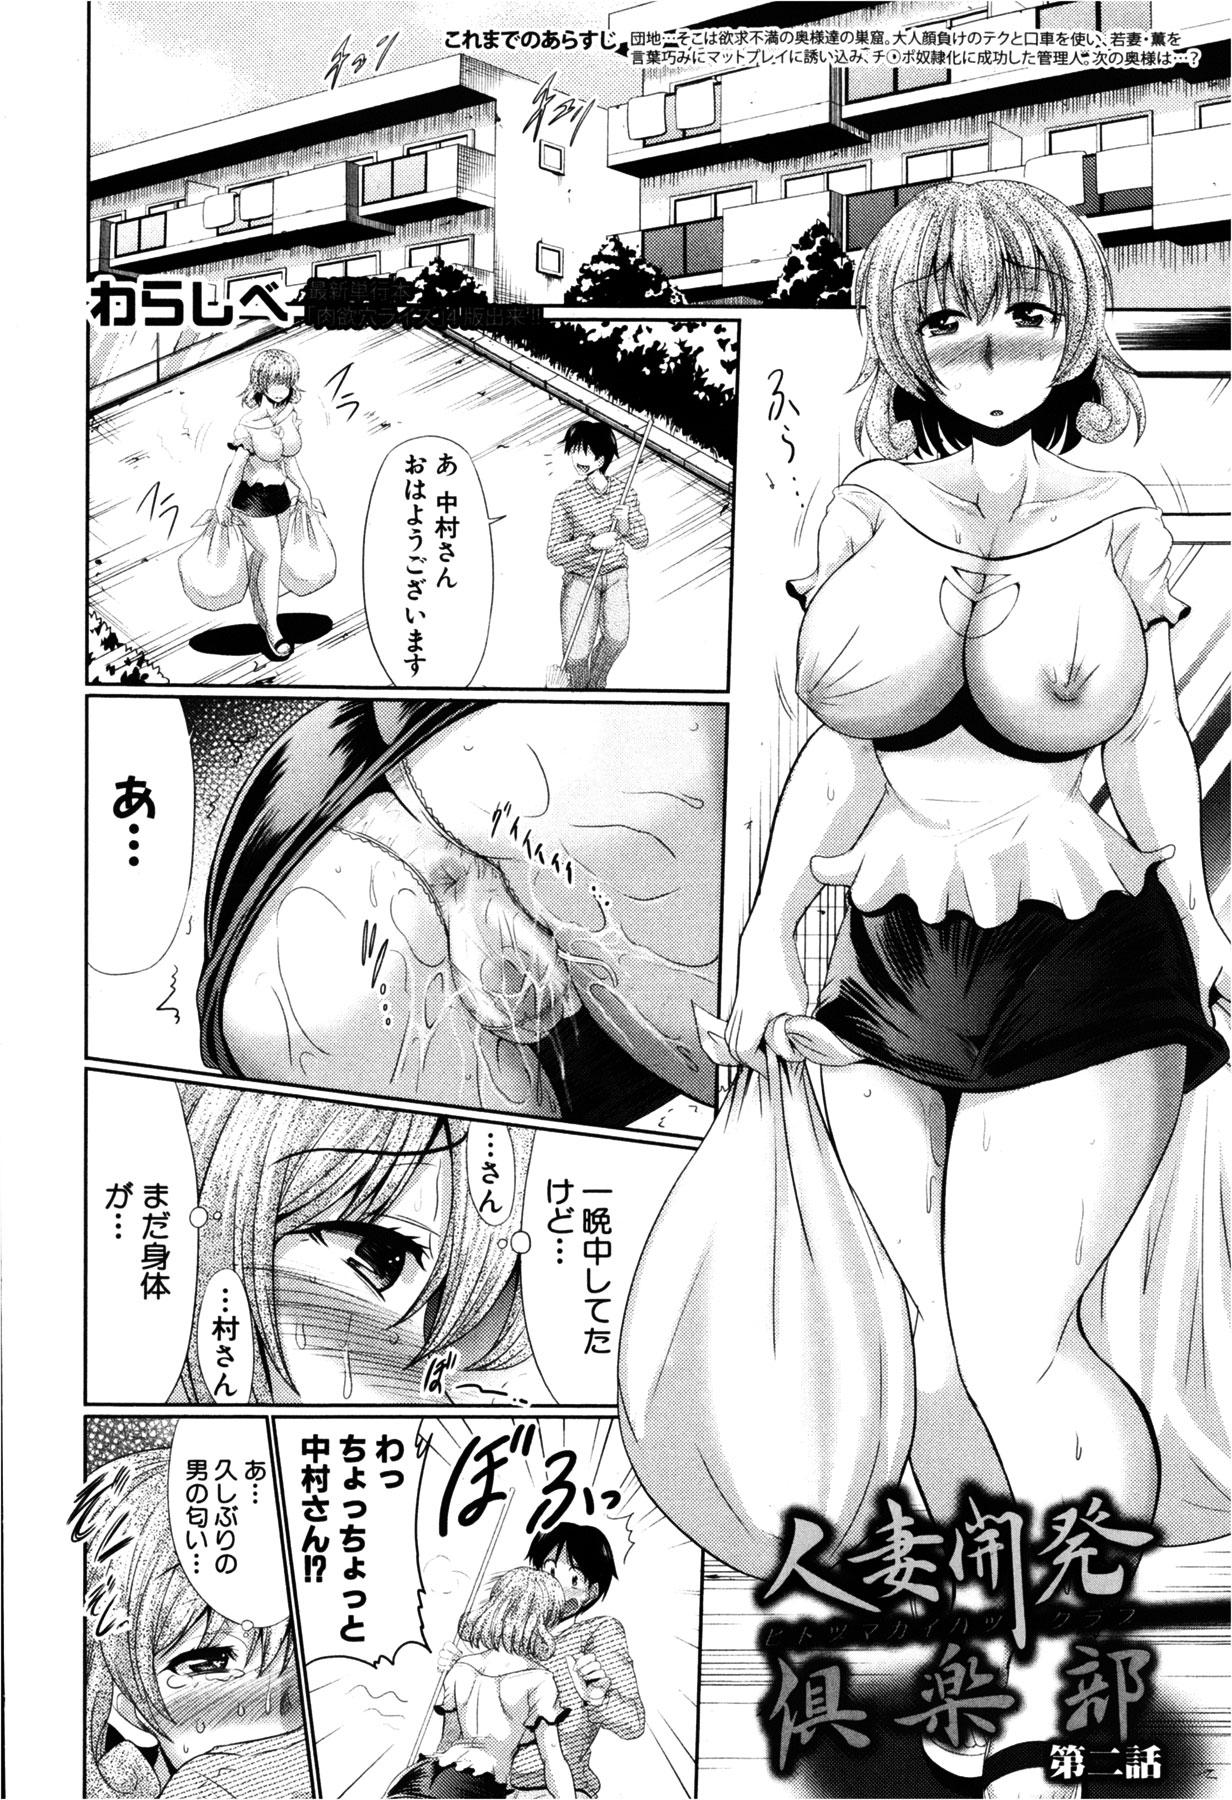 COMIC Shingeki 2013-02 9